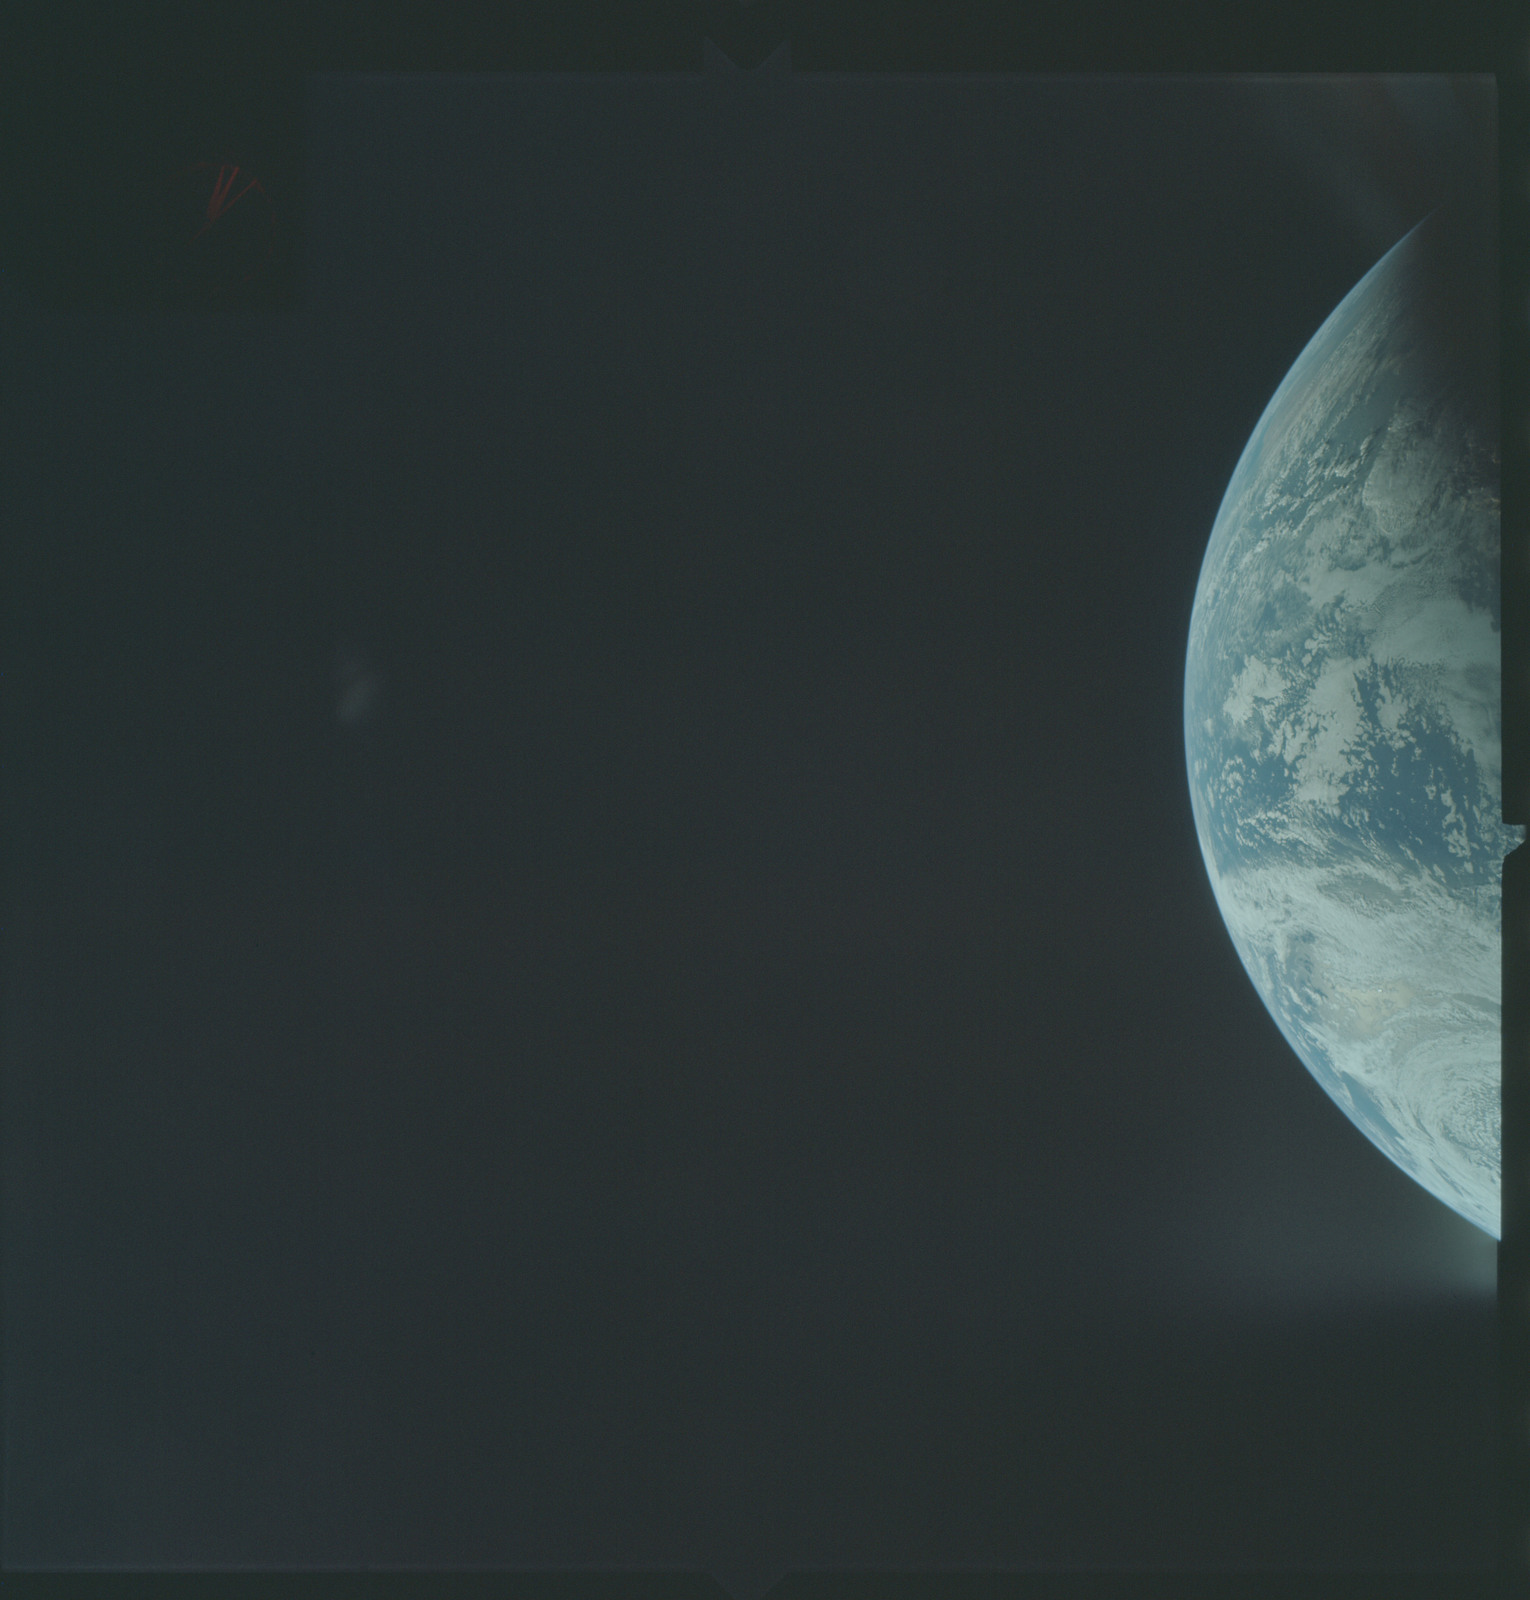 AS04-01-170 - Apollo 4 - Apollo 4 Mission - Atlantic Ocean,coastal Brazil and West Africa